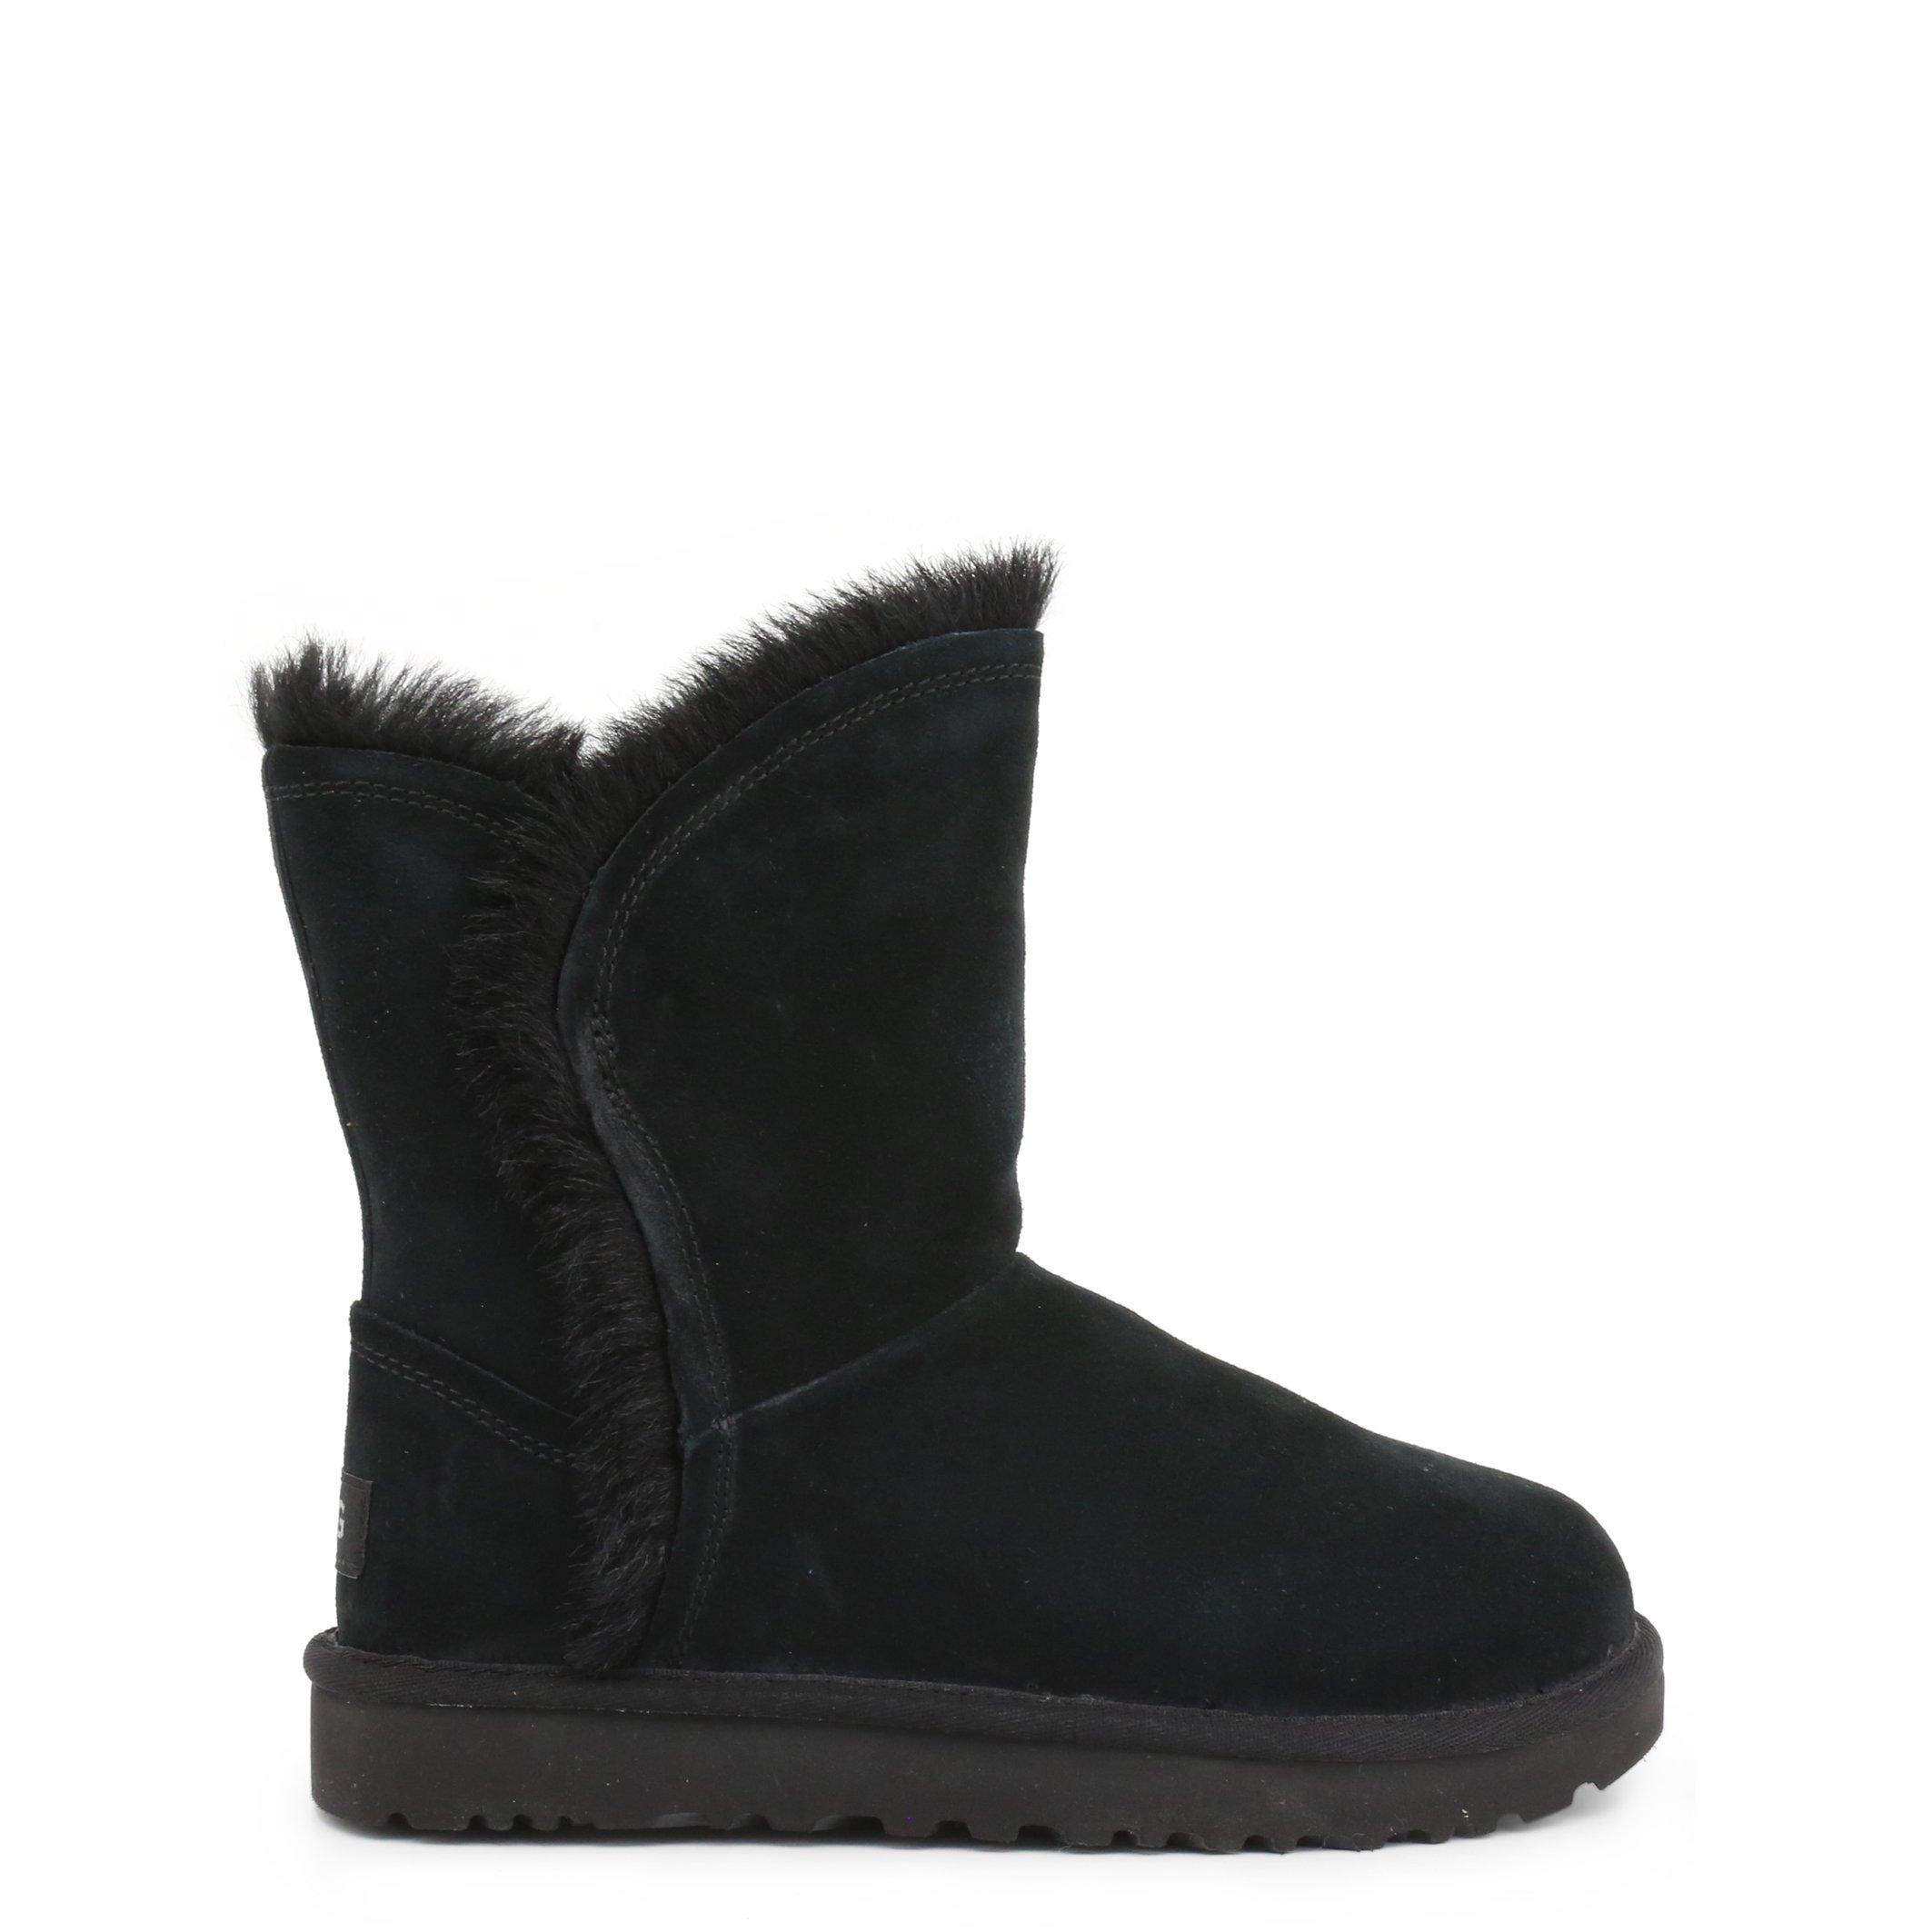 UGG Women's Ankle Boot Various Colours 1103746 - black EU 36